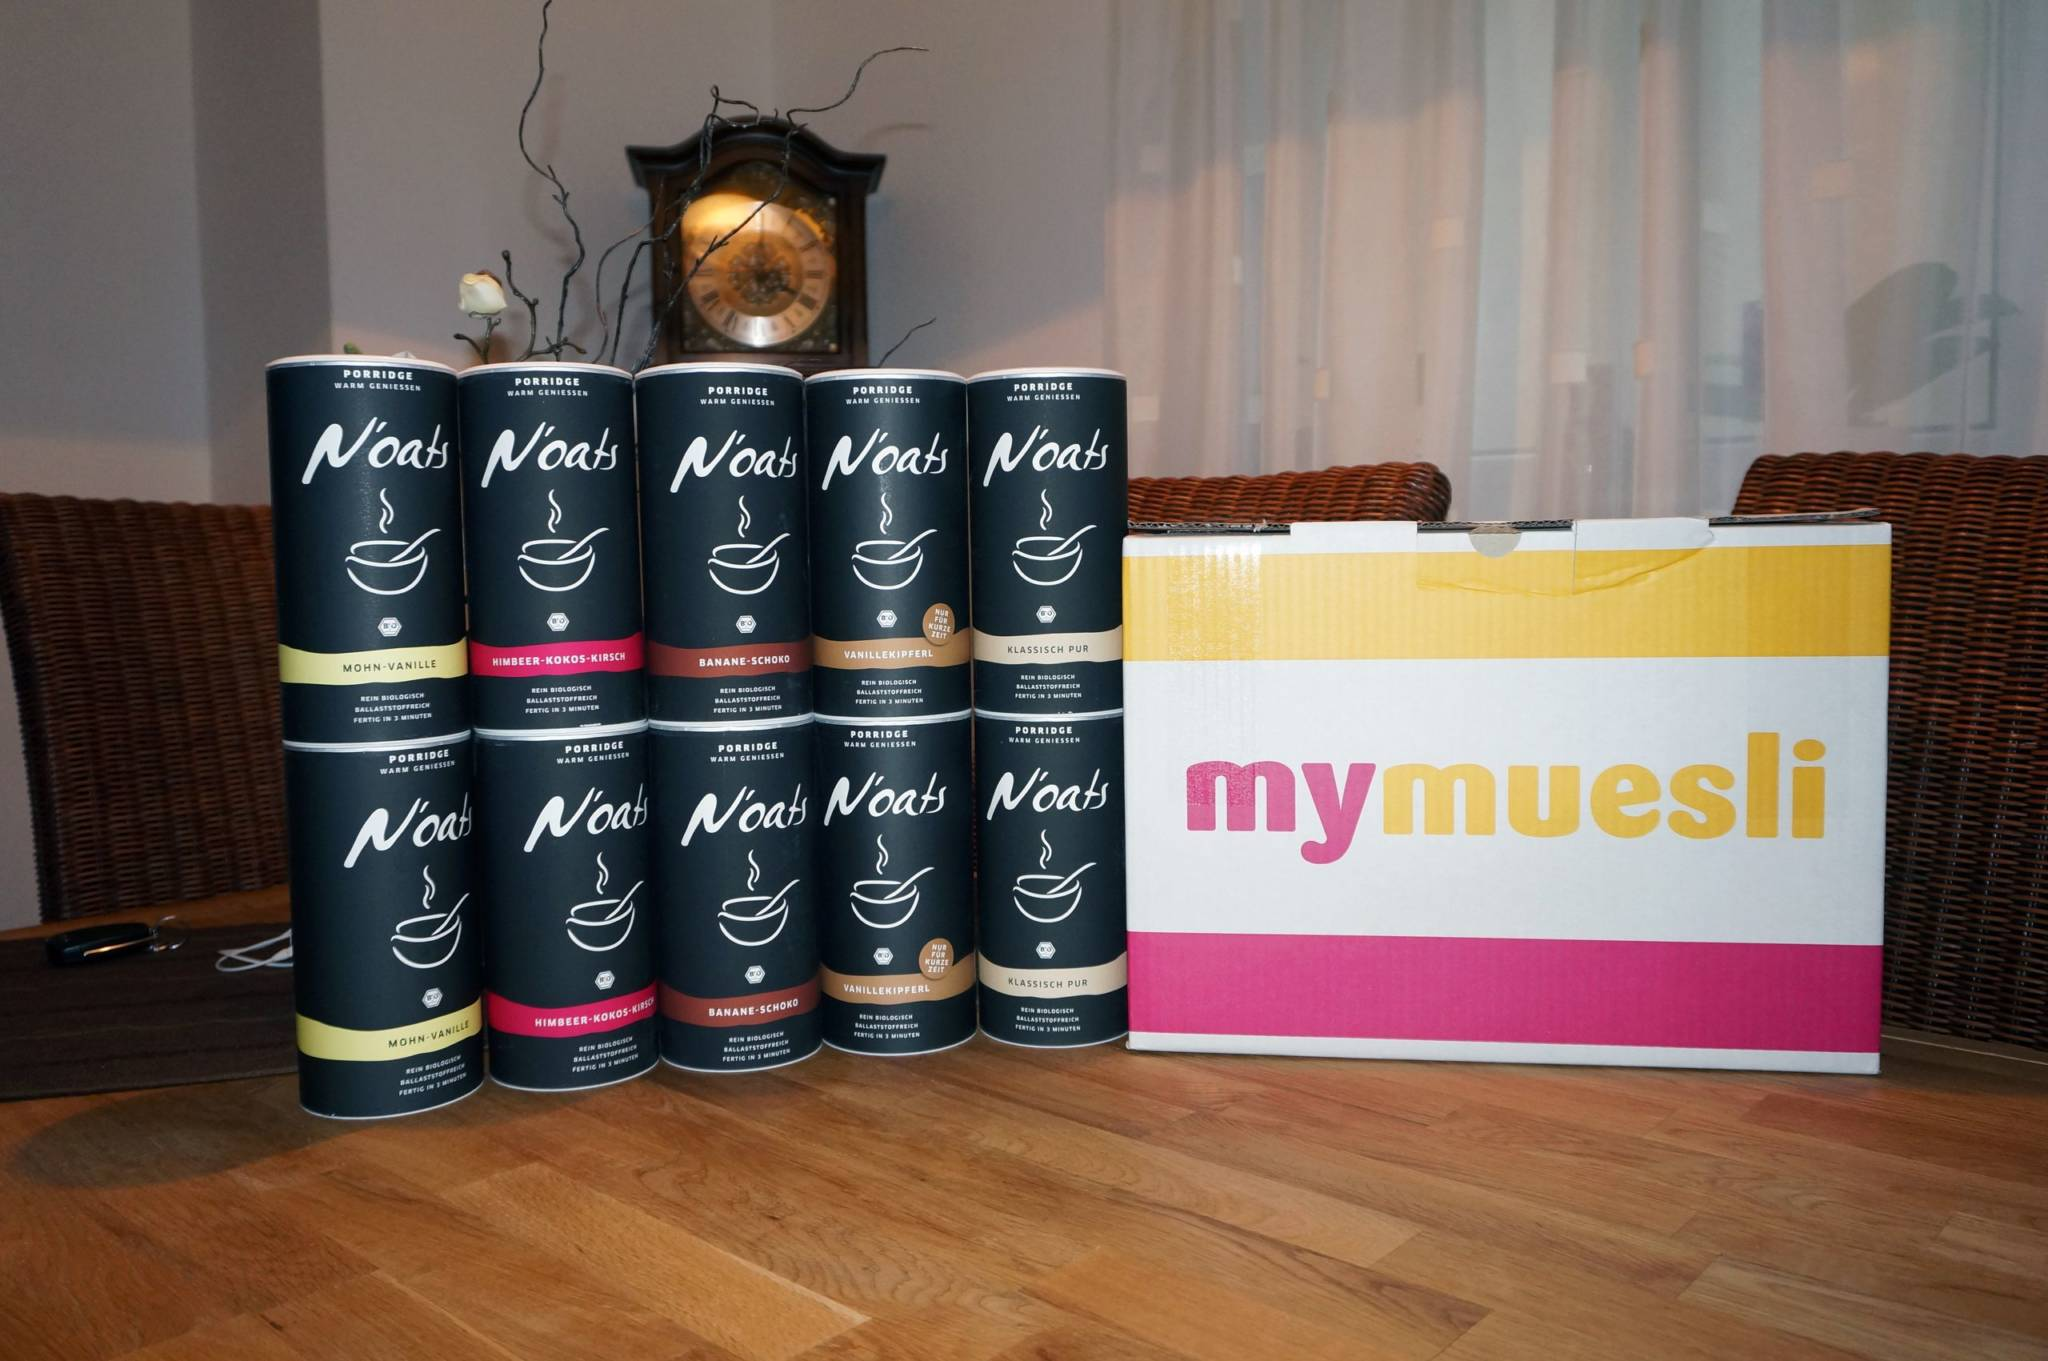 Review / Erfahrungsbericht – MyMuesli Noats (Porridge)